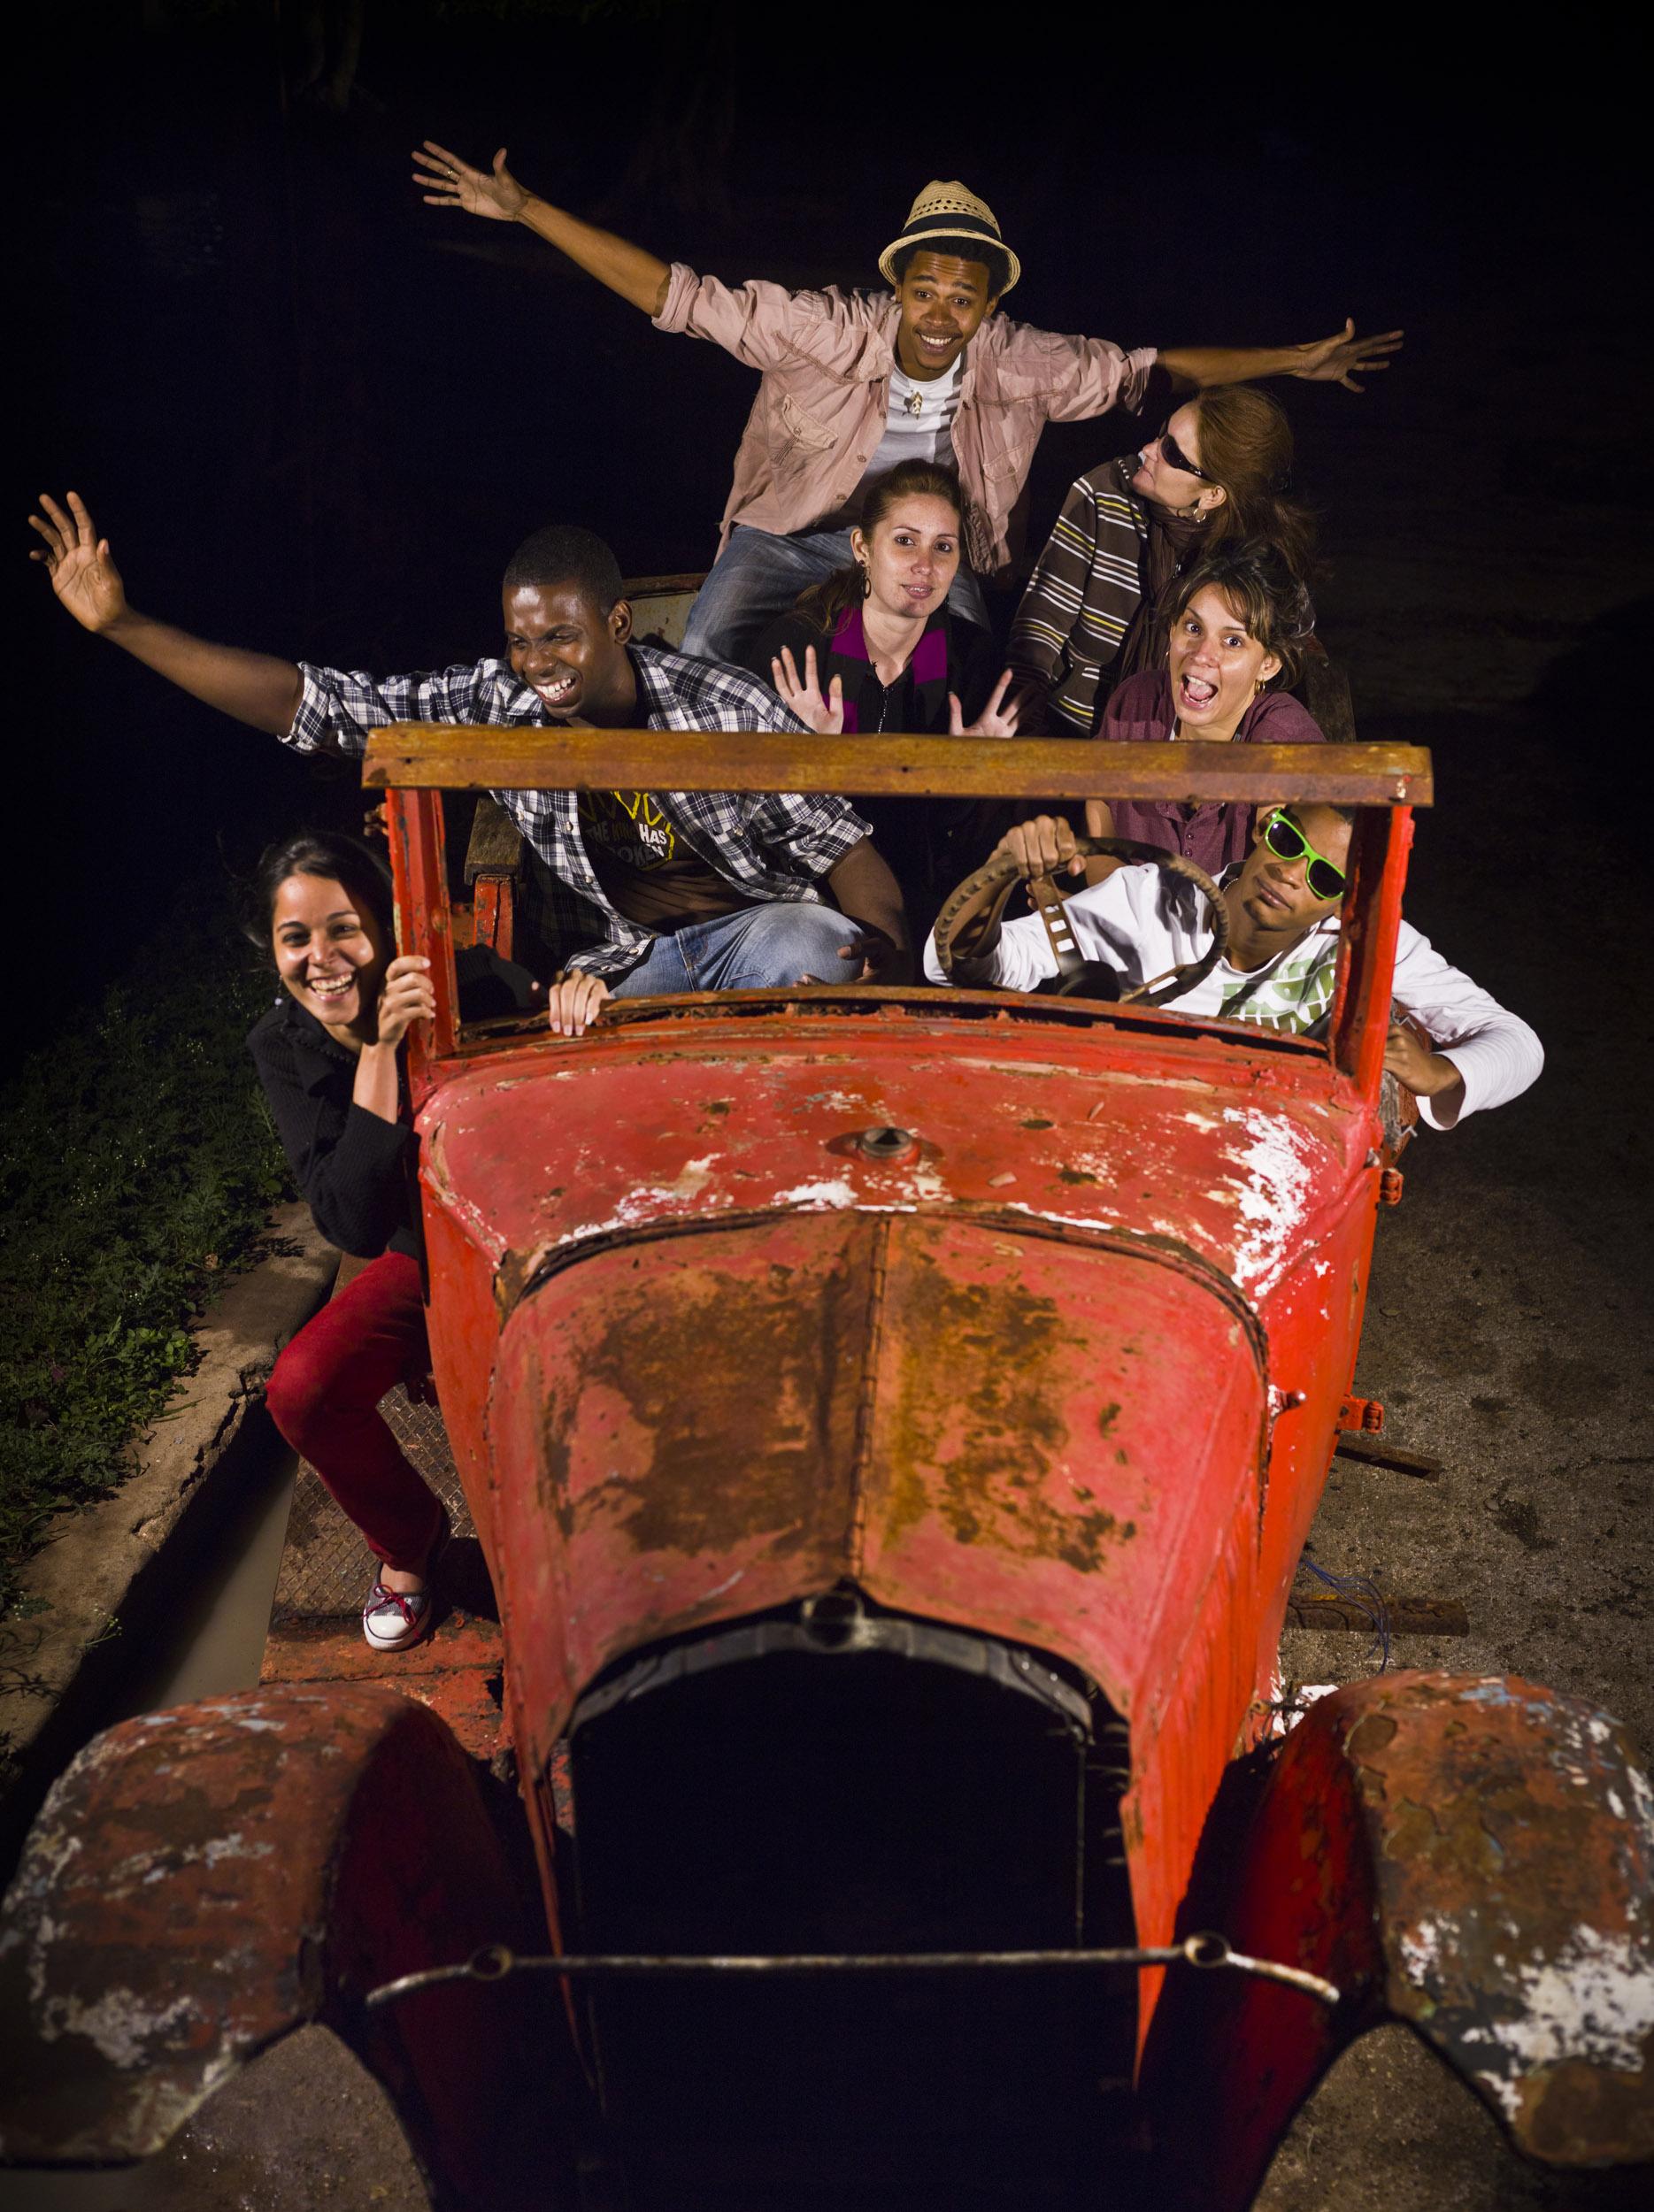 Colectivo F8, fotógrafos - Illuminated Cuba - Hector Garrido, Aerial and human photography